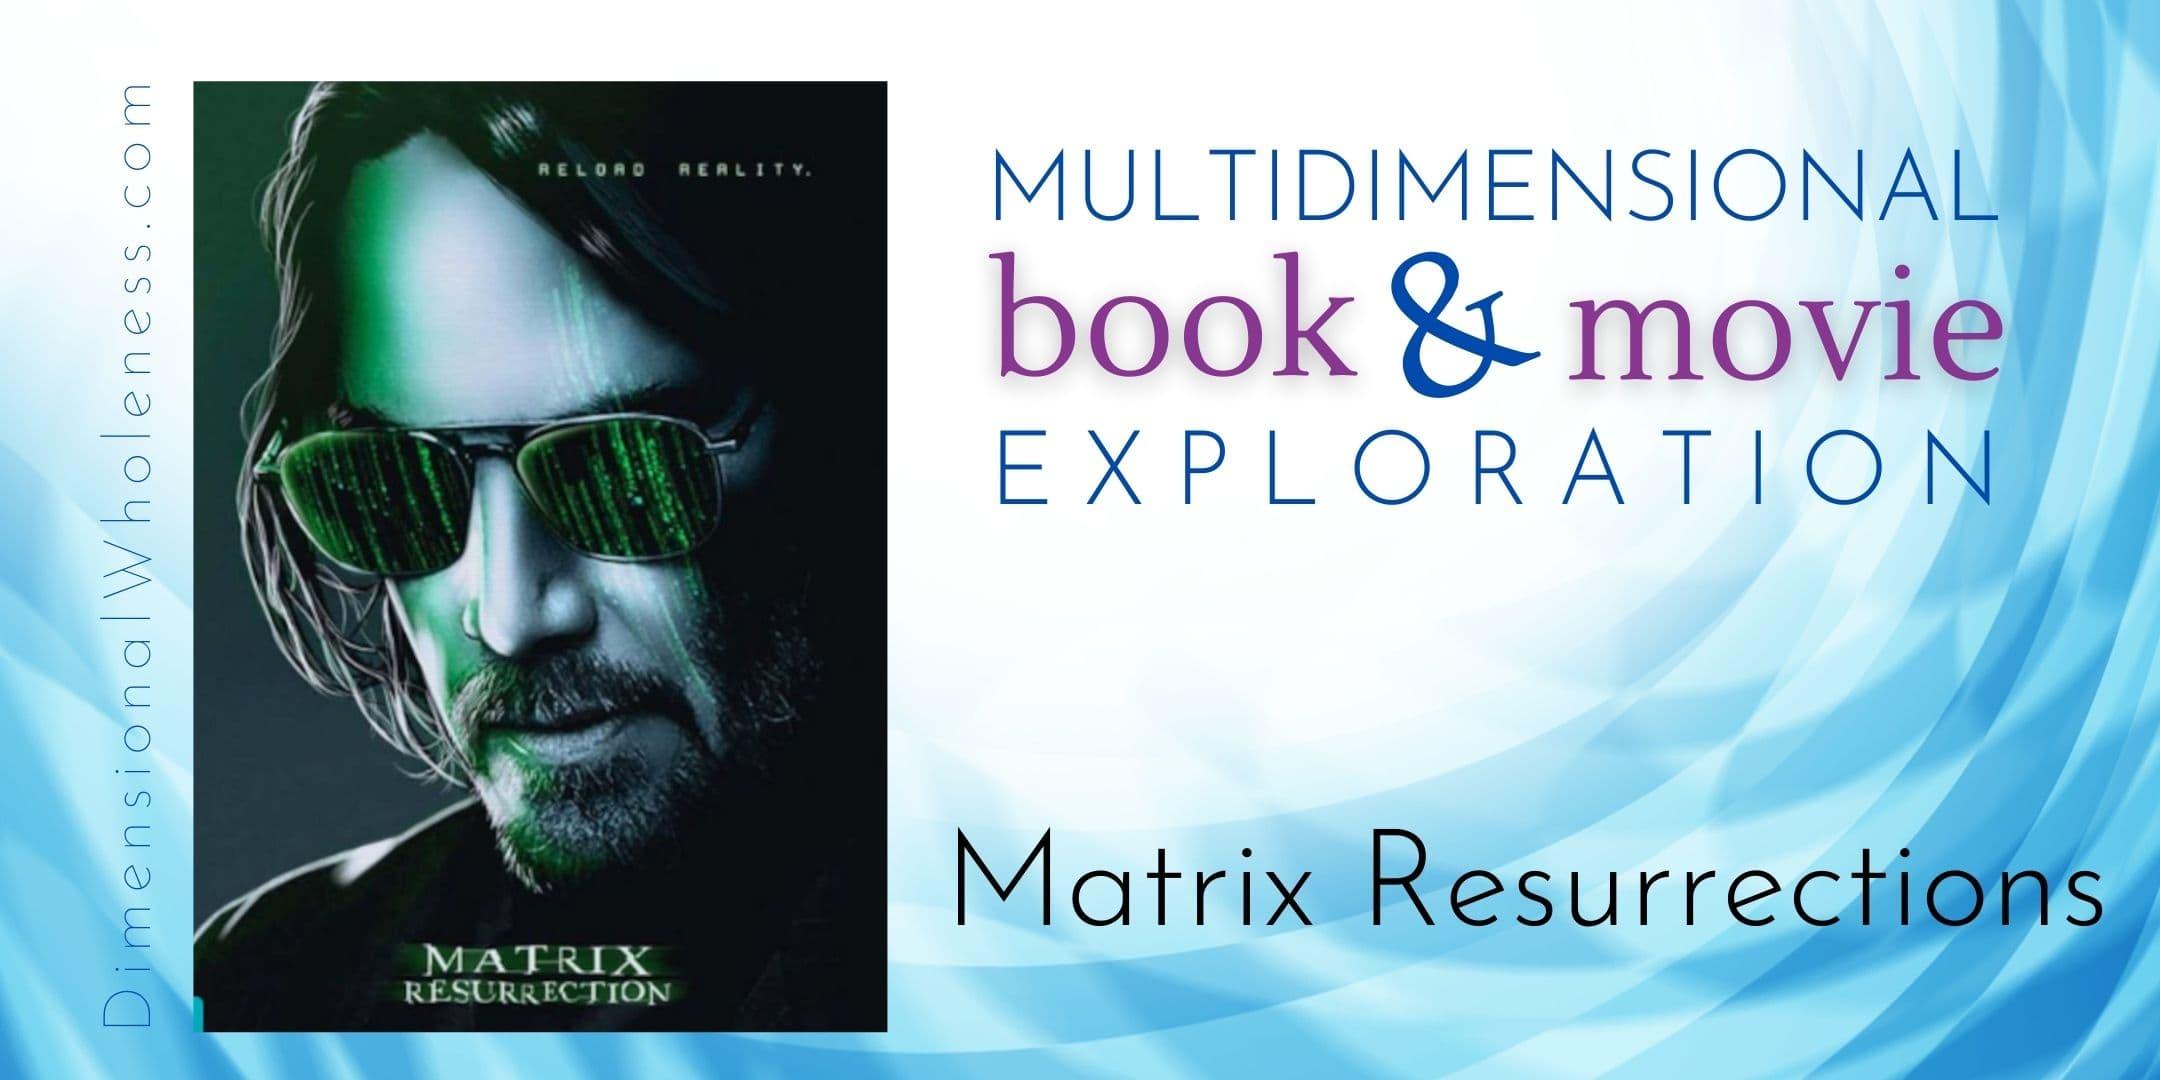 Multidimensional Book and Movie Exploration: The Matrix Resurrections